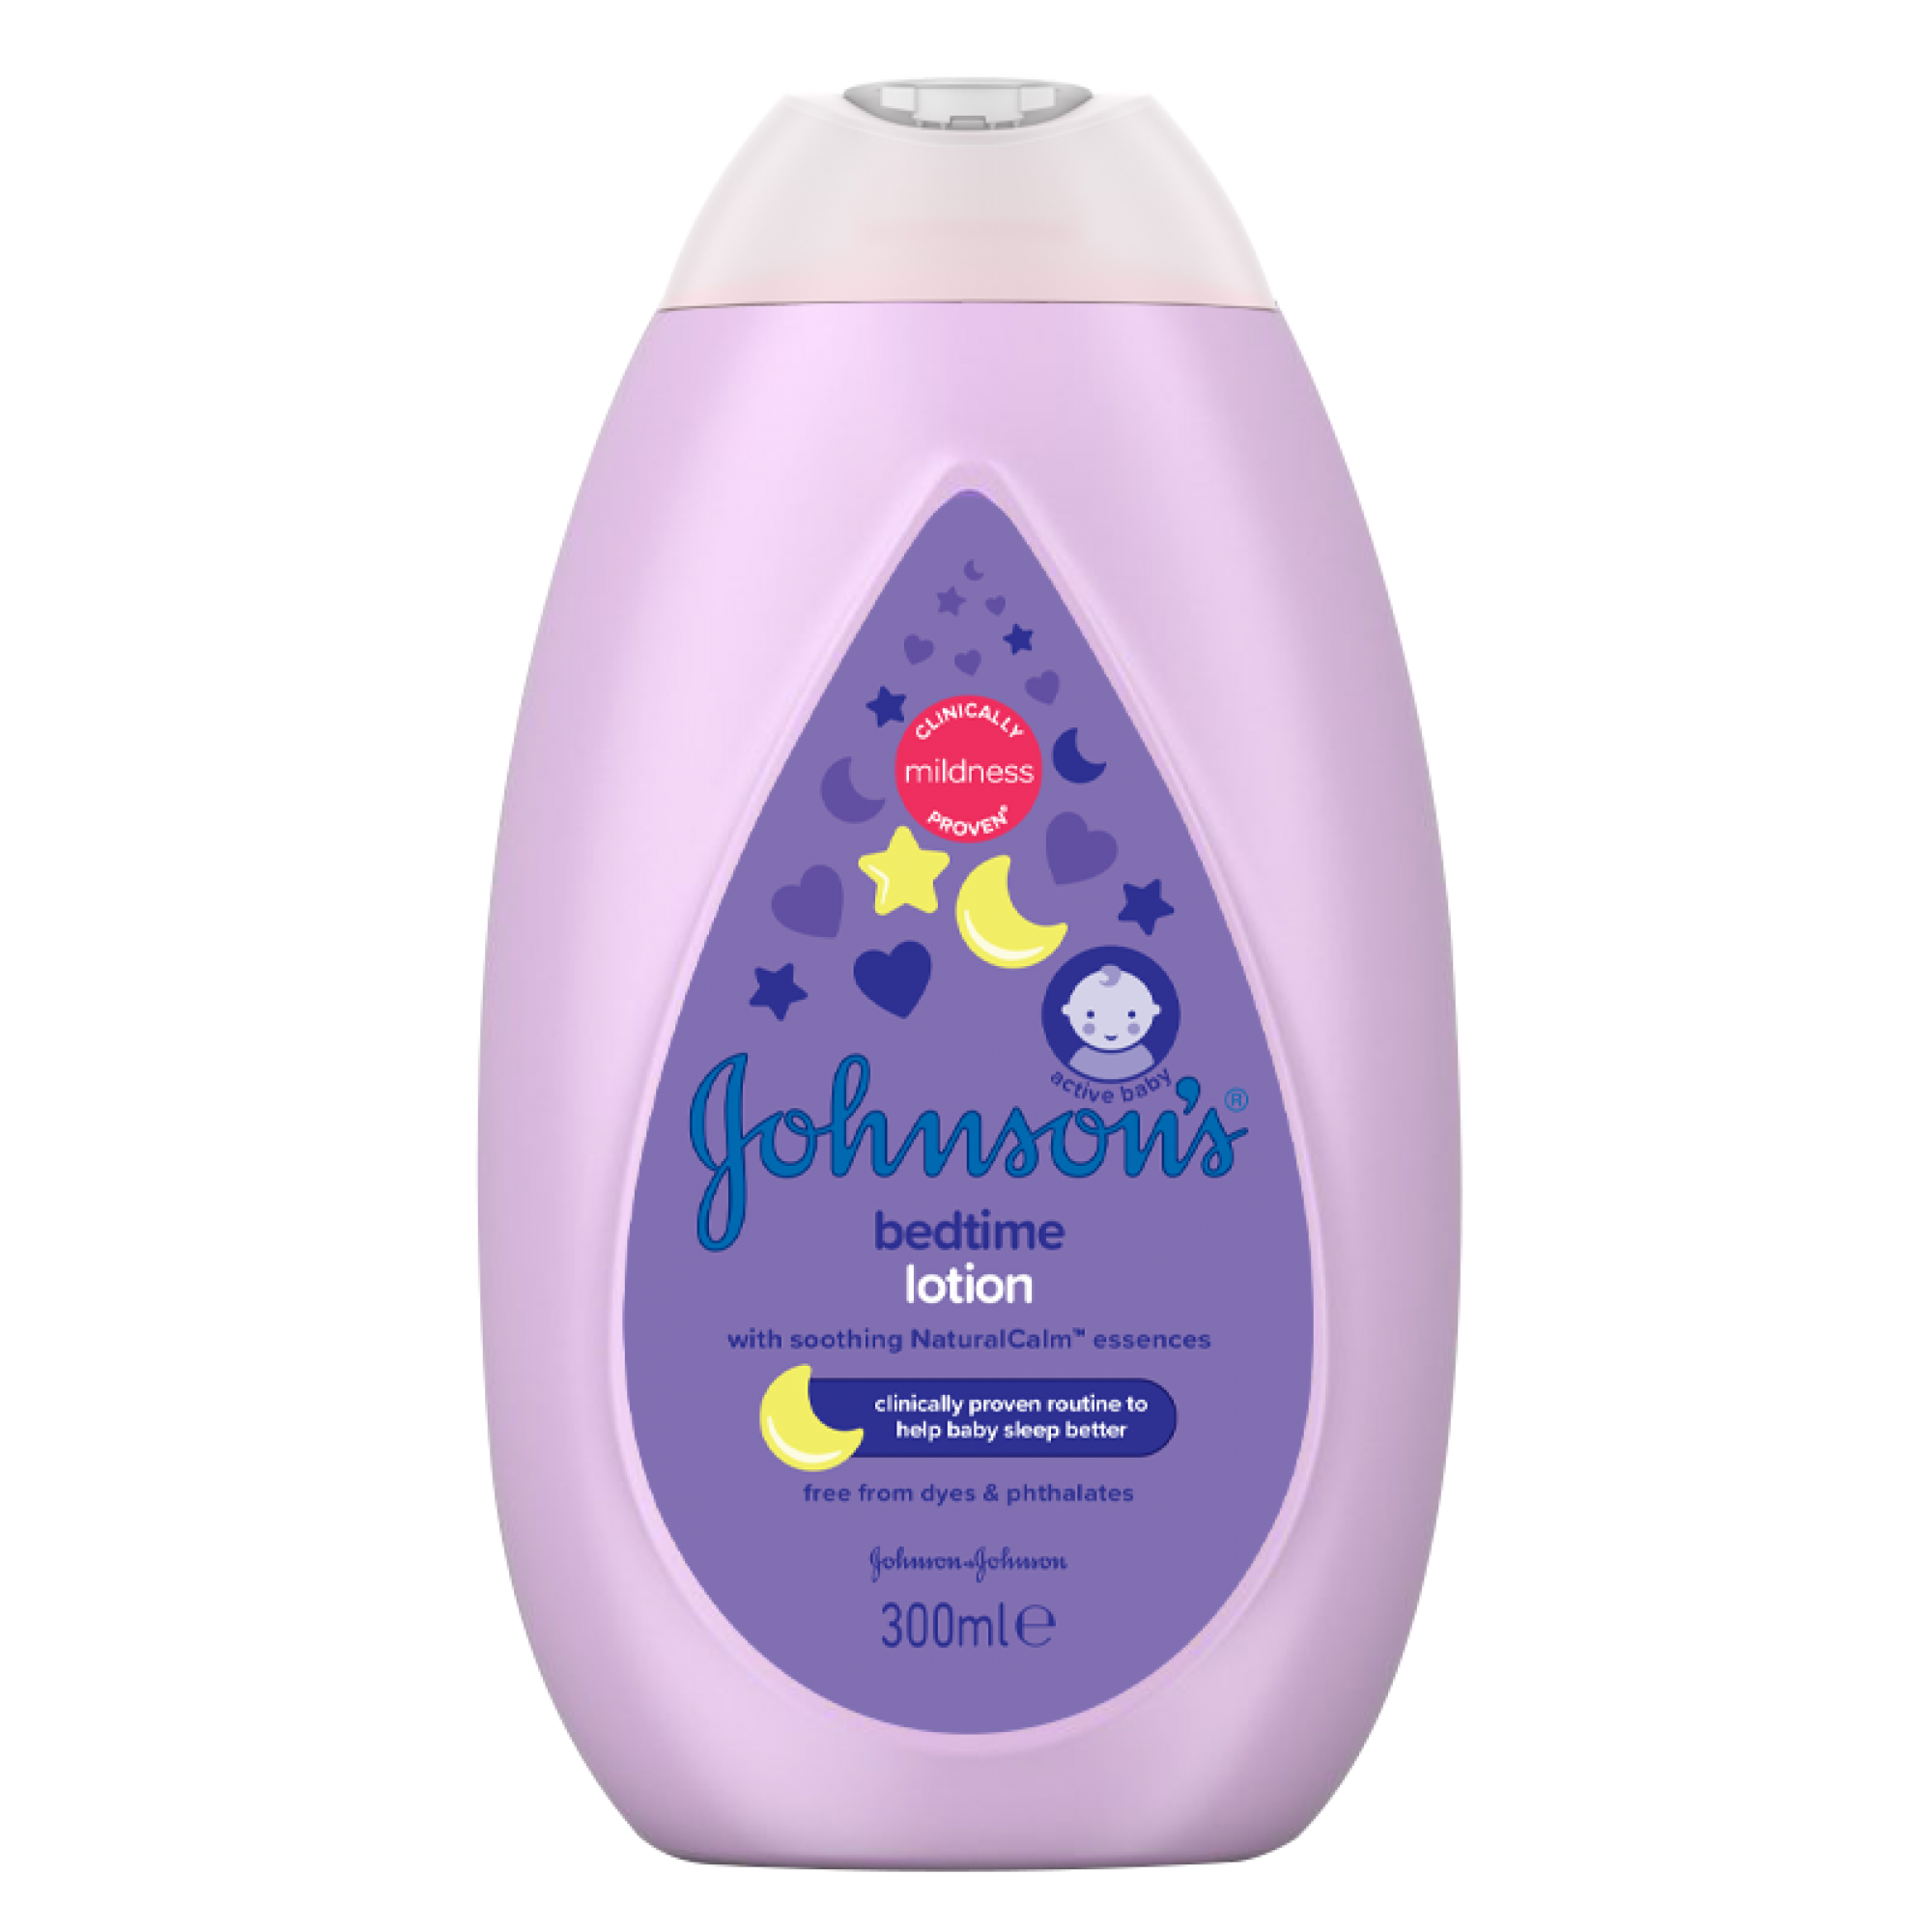 Lotiune de corp cu levantica Johnson's Baby Bedtime, 300 ml